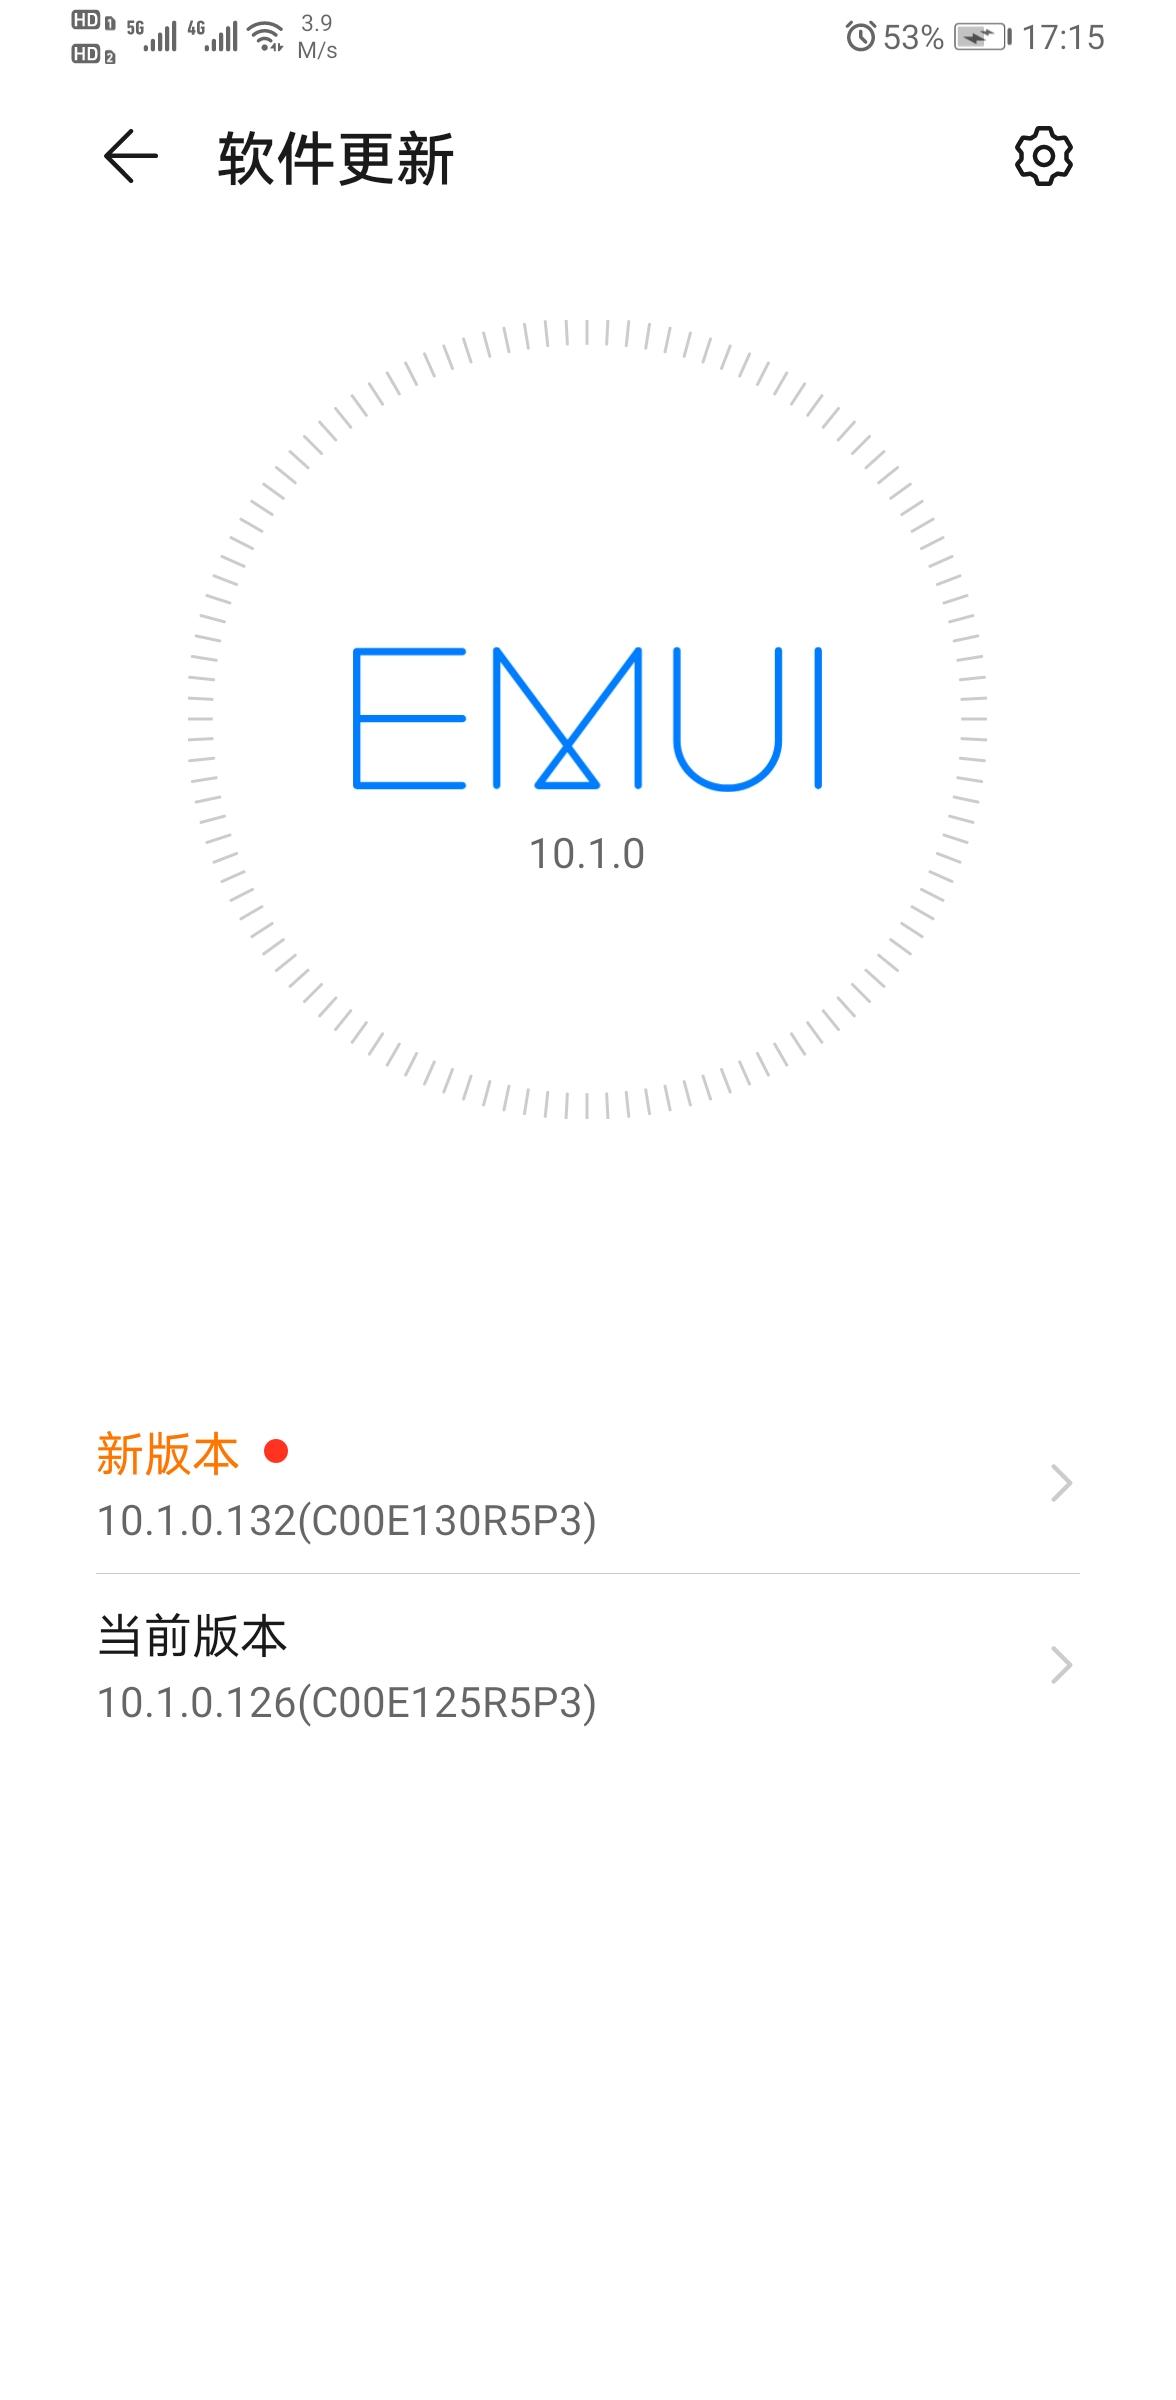 Screenshot_20200514_171541_com.huawei.android.hwouc.jpg